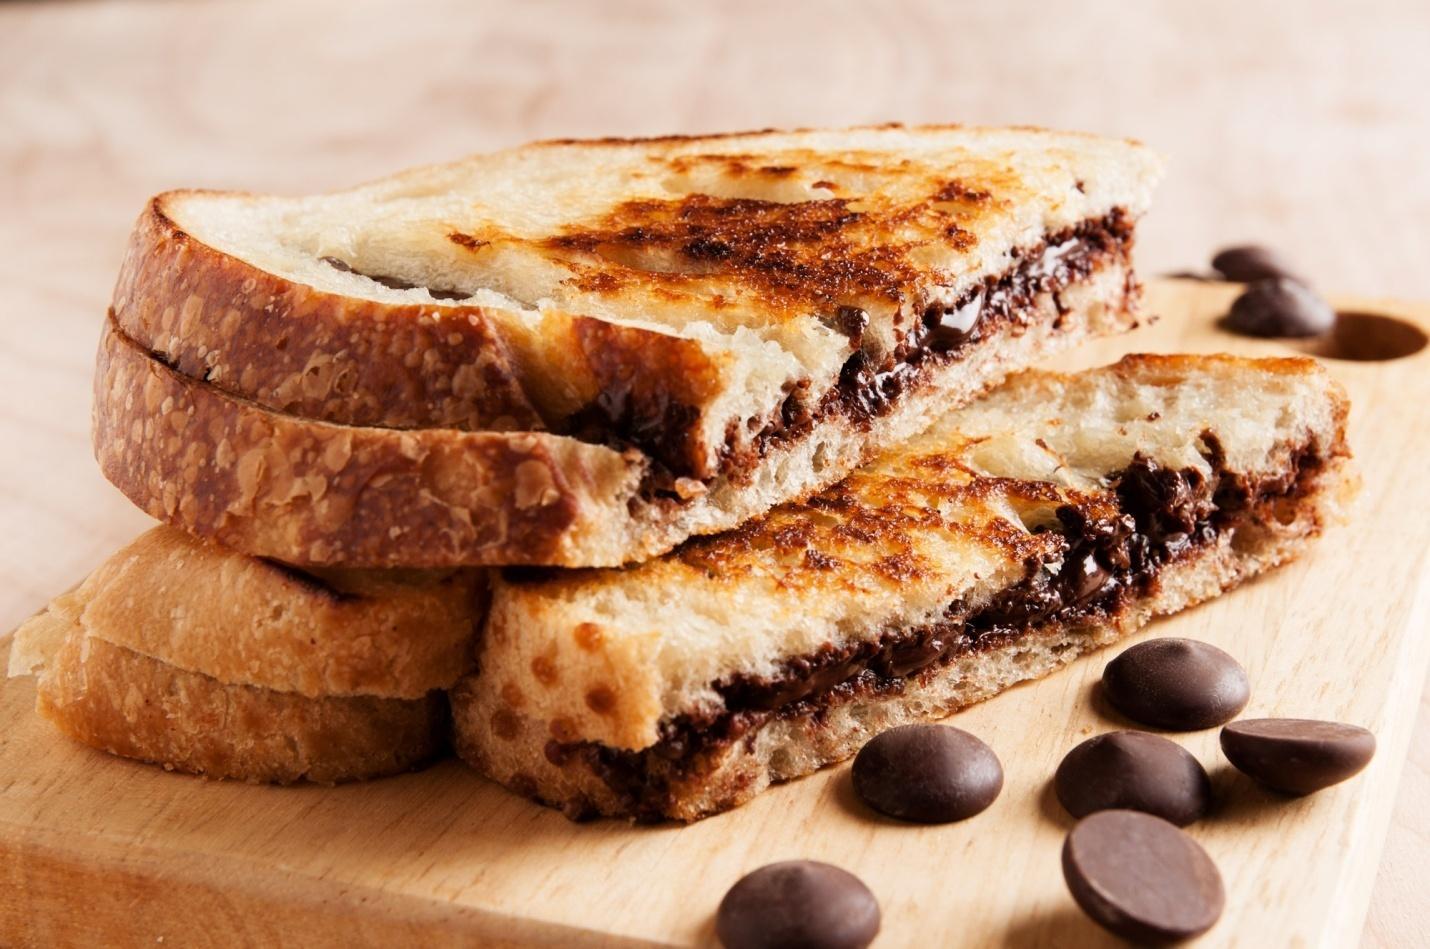 C:\Users\user\Desktop\Reacho\pics\Chocolate_Sandwiches-2.jpg